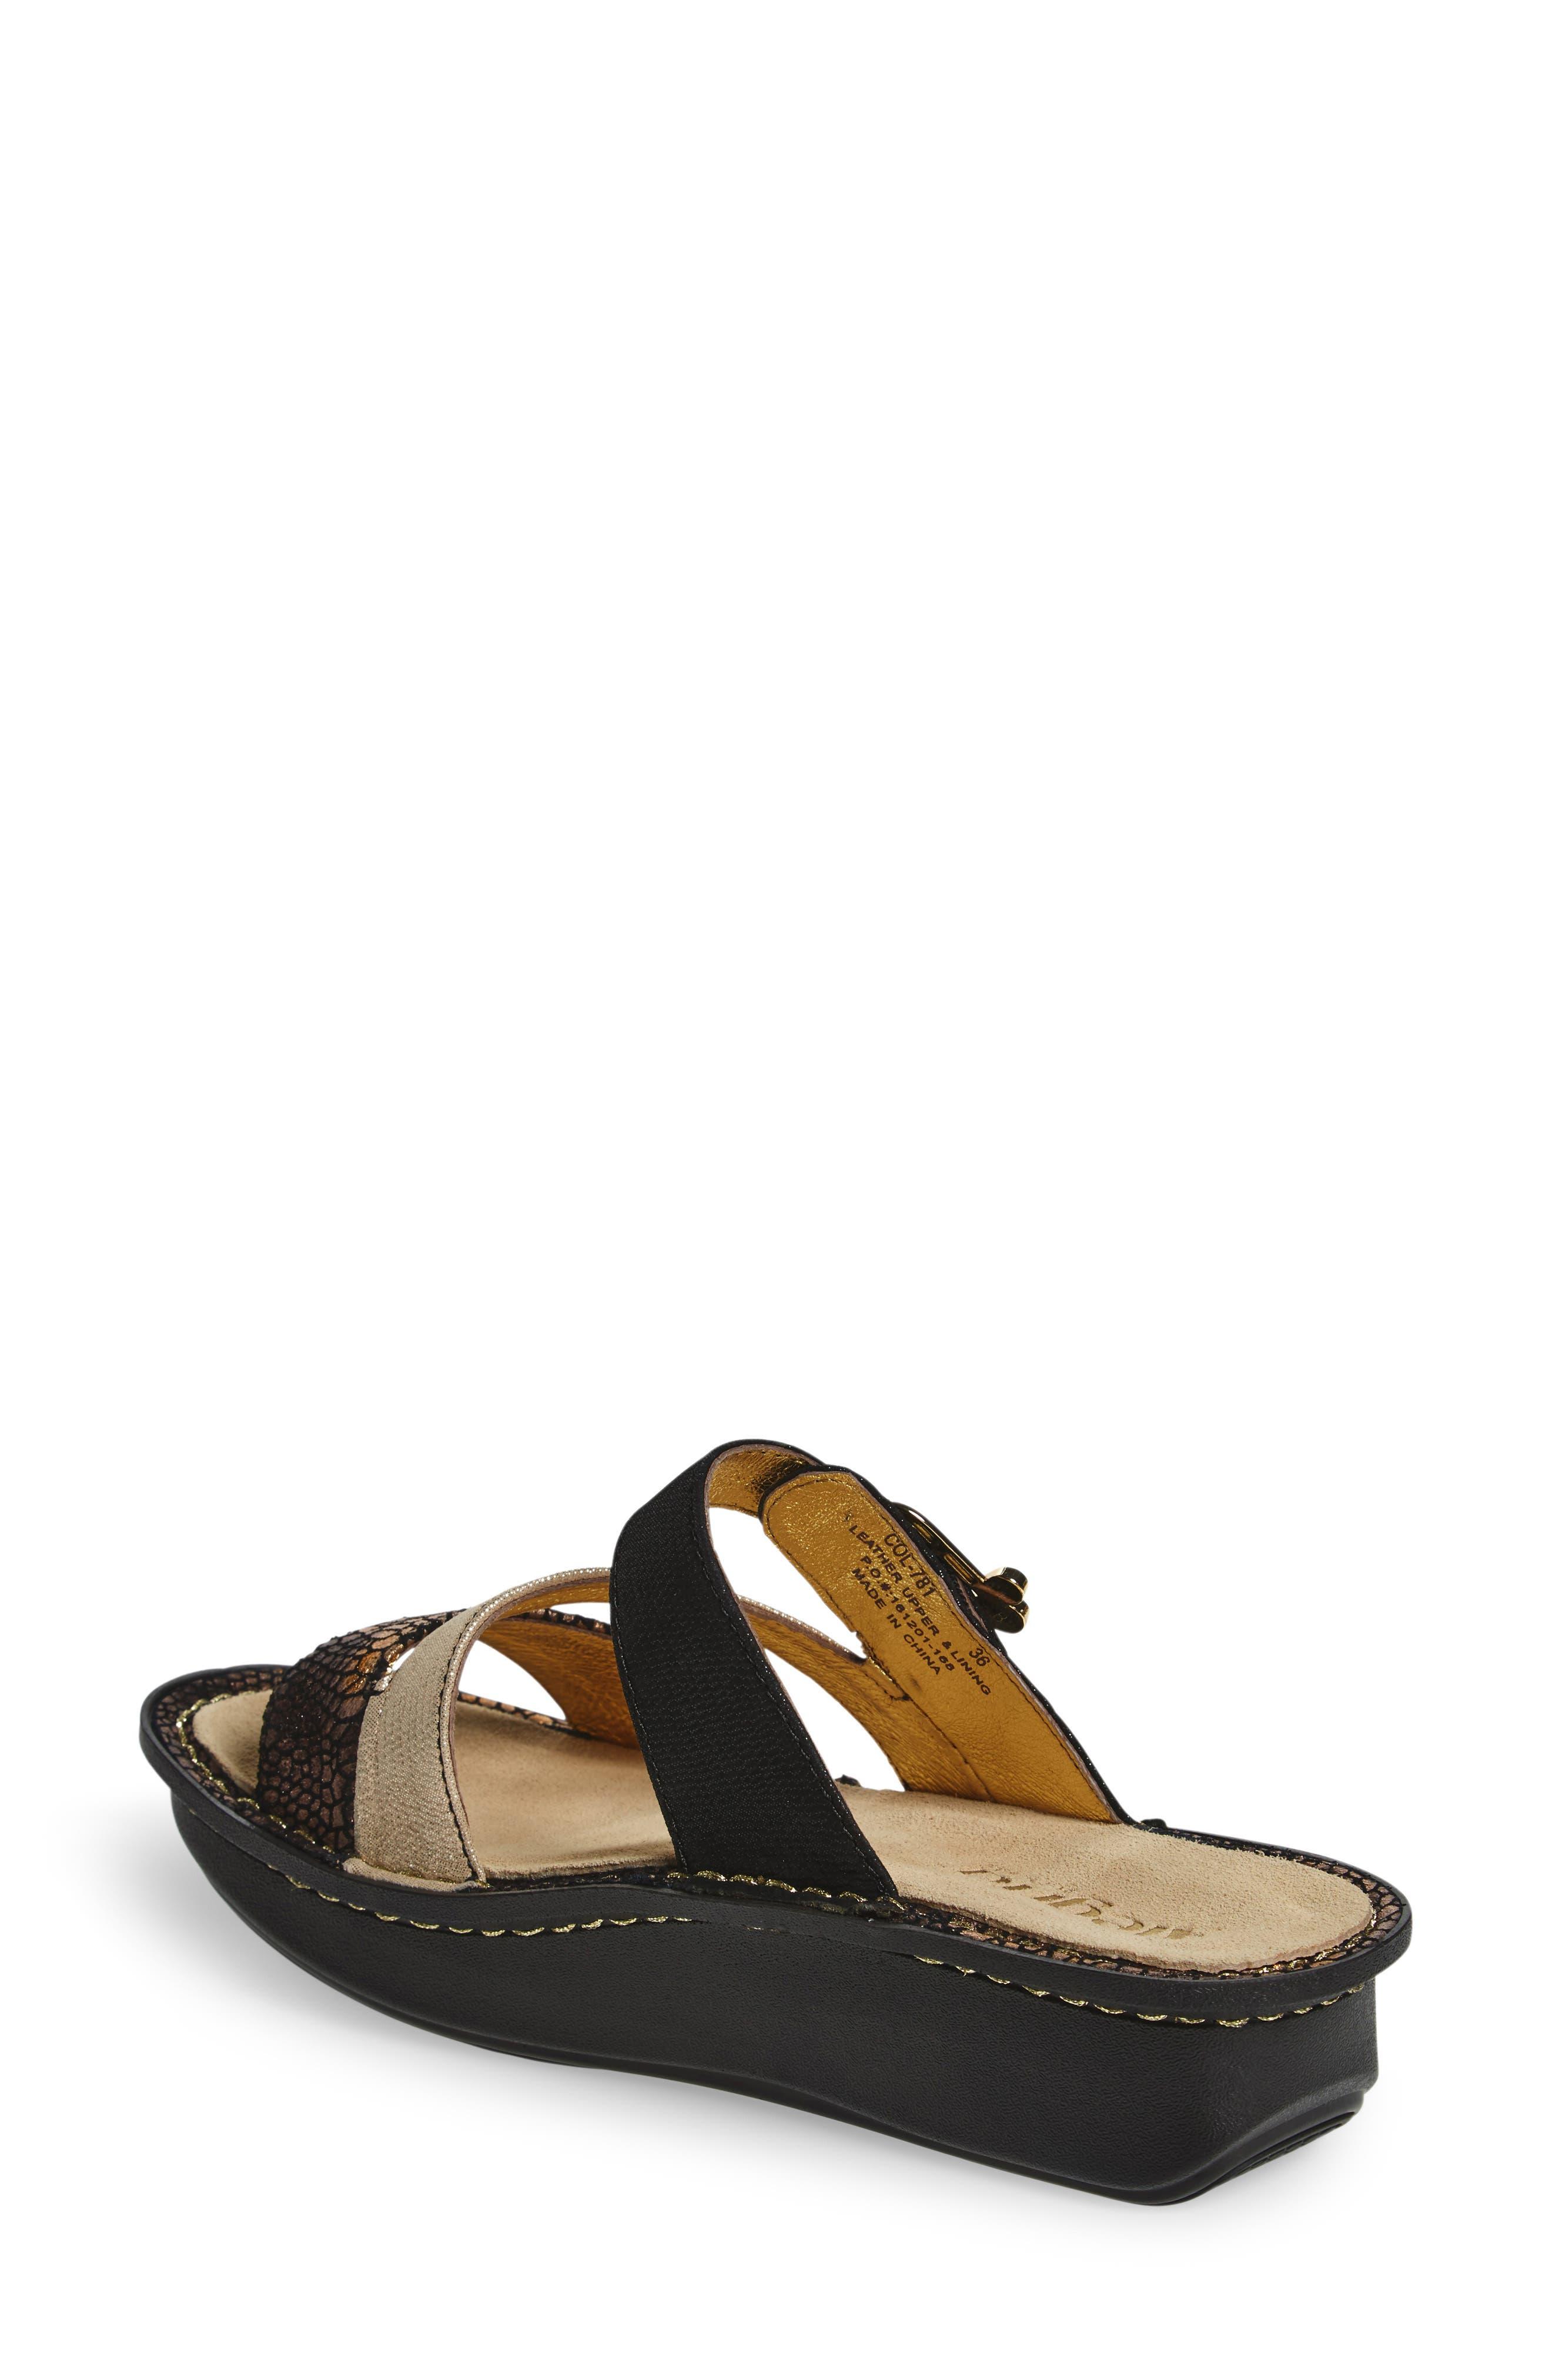 'Colette' Platform Sandal,                             Alternate thumbnail 26, color,